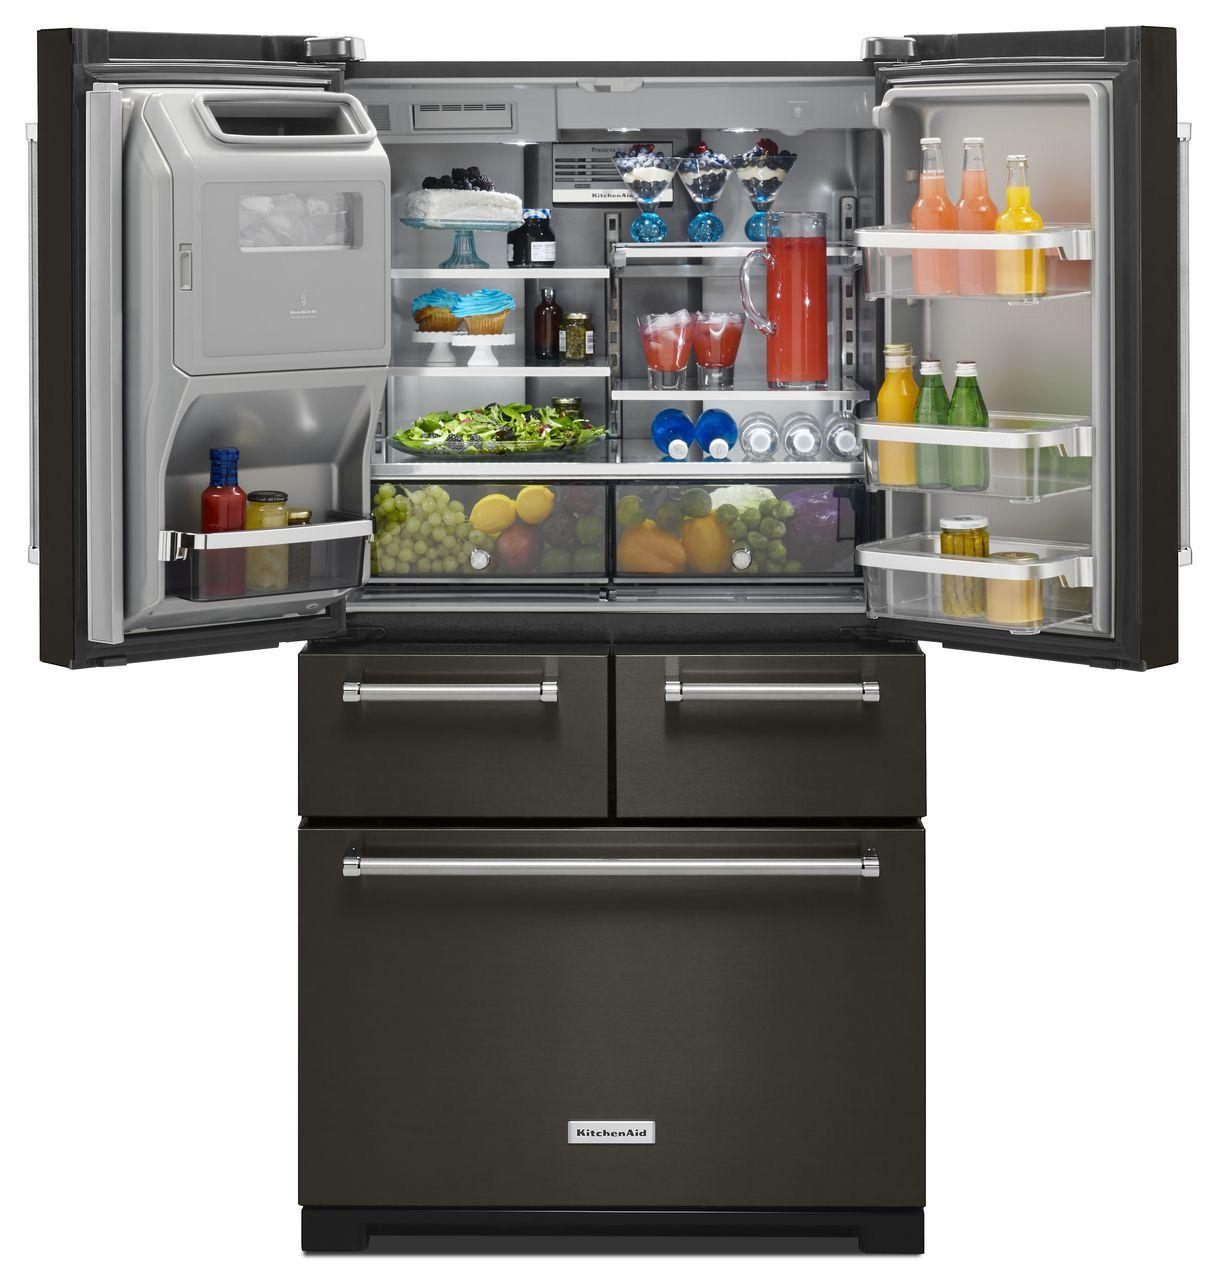 Kitchen Aid Appliances Reviews Kitchenaid Appliances Reviews Canada Cliff Kitchen